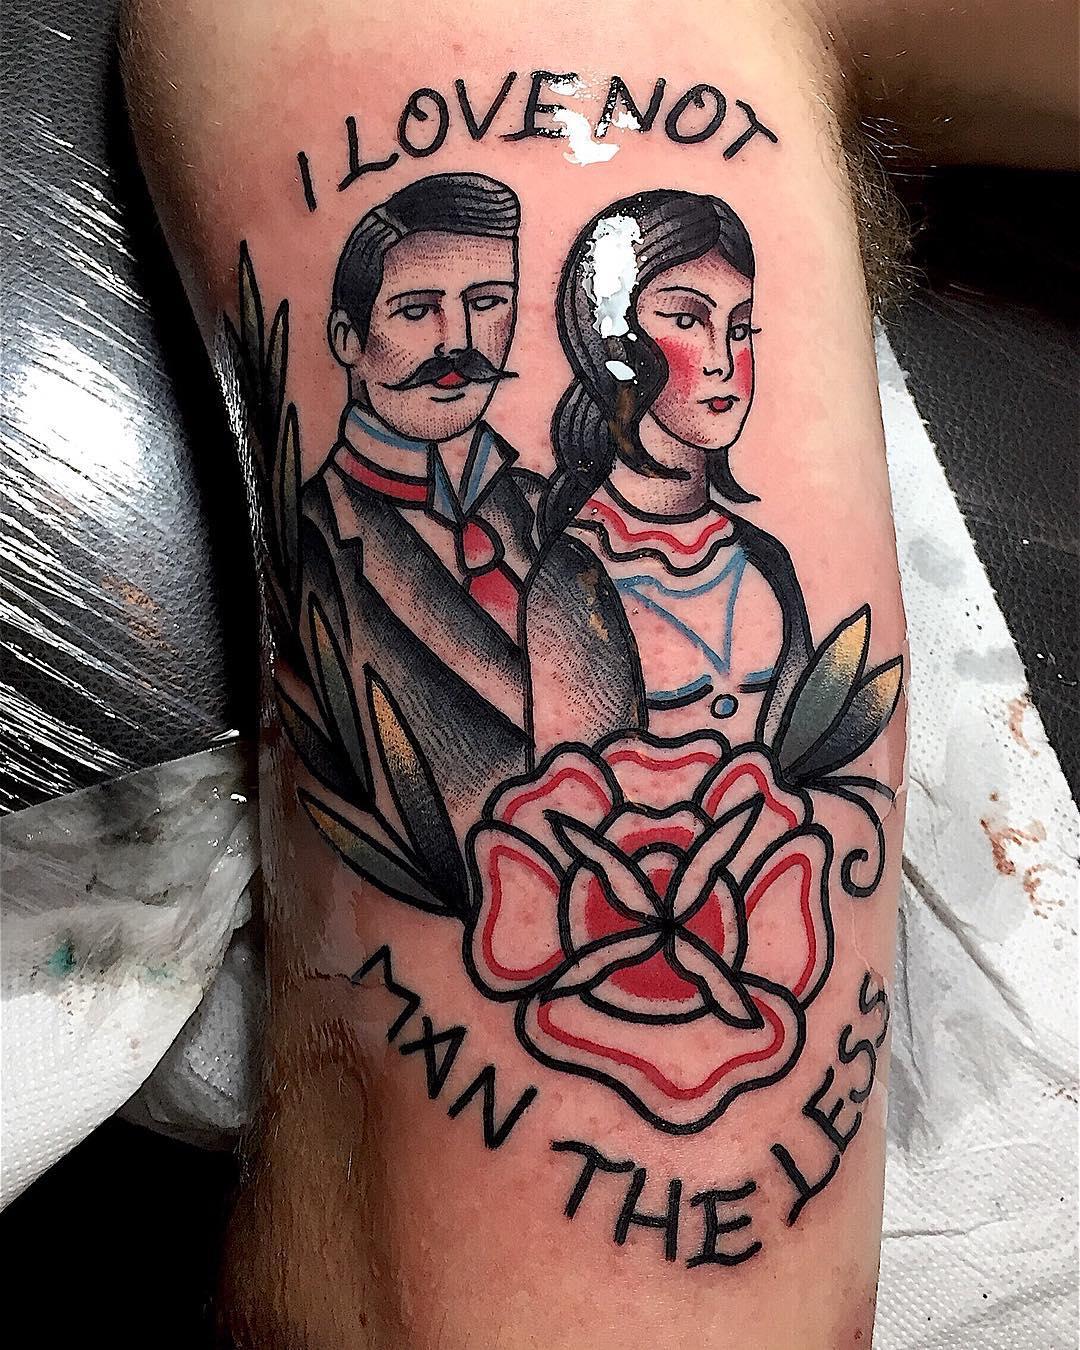 tattooart,art,artistic,old,oldschollshit,custommade,owl,tabasco,berlintattoo,barcelonatattoo,ibizatattoo,tabascotattooer,bestattooers,tradicionaltattooers,bestisbest,tatuajes,berlintattooers,ontheroad,classictattoo,tendencia,creativity,bobinas,tradicional,studyofberlin,tattooart,art,artistic,old,oldschollshit,custommade,owl,tabasco,berlintattoo,barcelonatattoo,ibizatattoo,tabascotattooer,bestattooers,tradicionaltattooers,bestisbest,tatuajes,berlintattooers,ontheroad,classictattoo,tendencia,creativity,bobinas,tradicional,studyofberlin,tradworkers